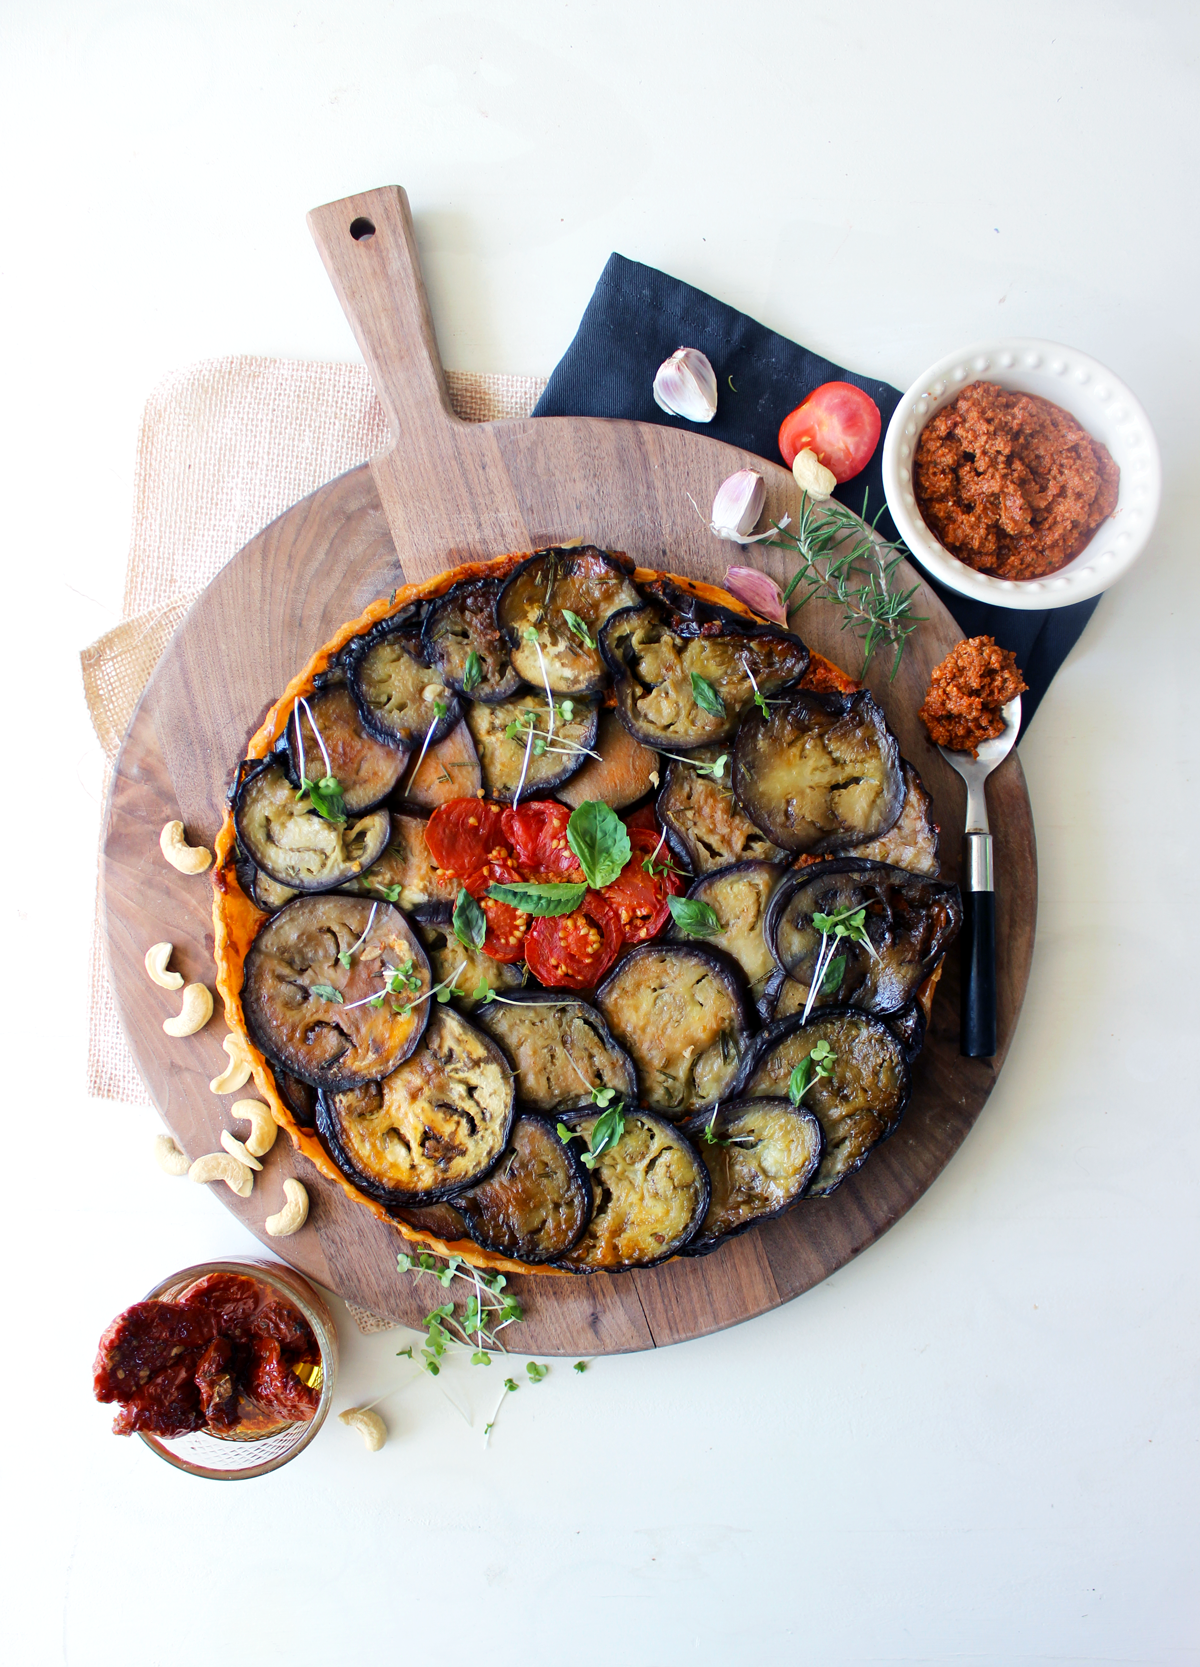 Tarte tatin d'aubergines au pesto de tomates séchées